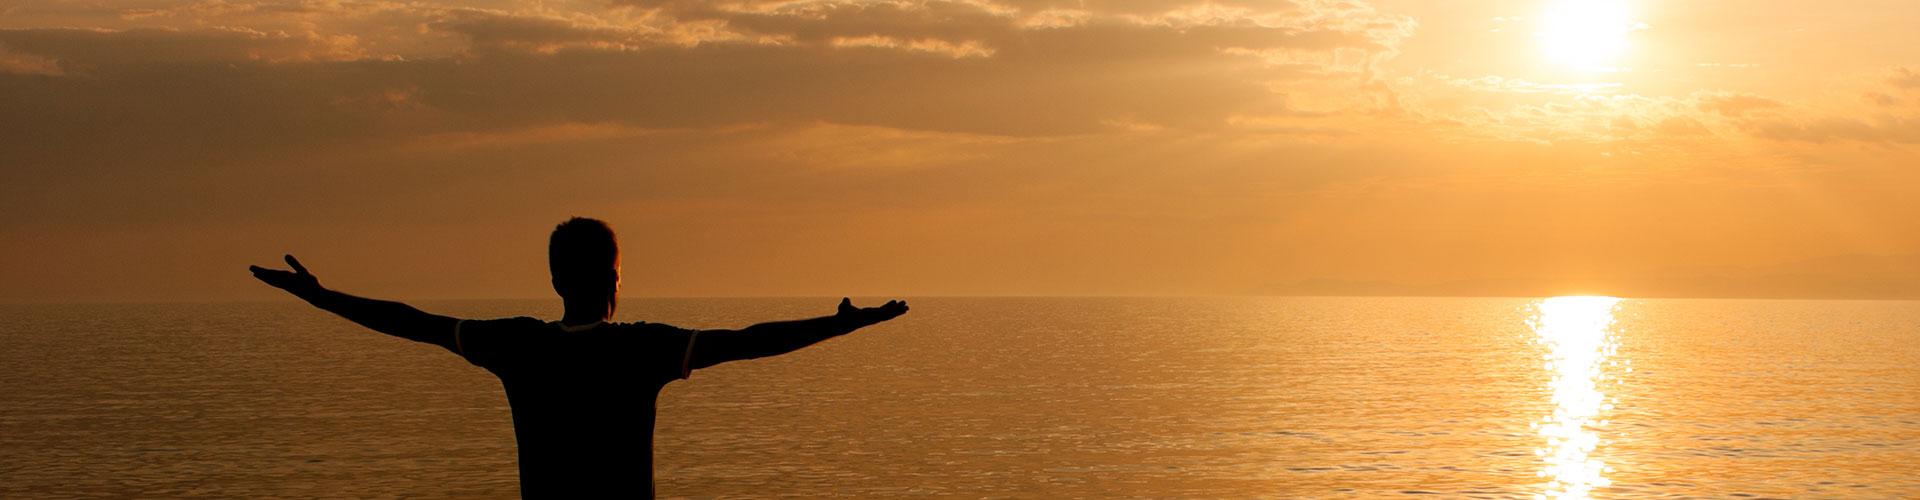 mind-wellness-free-your-mind